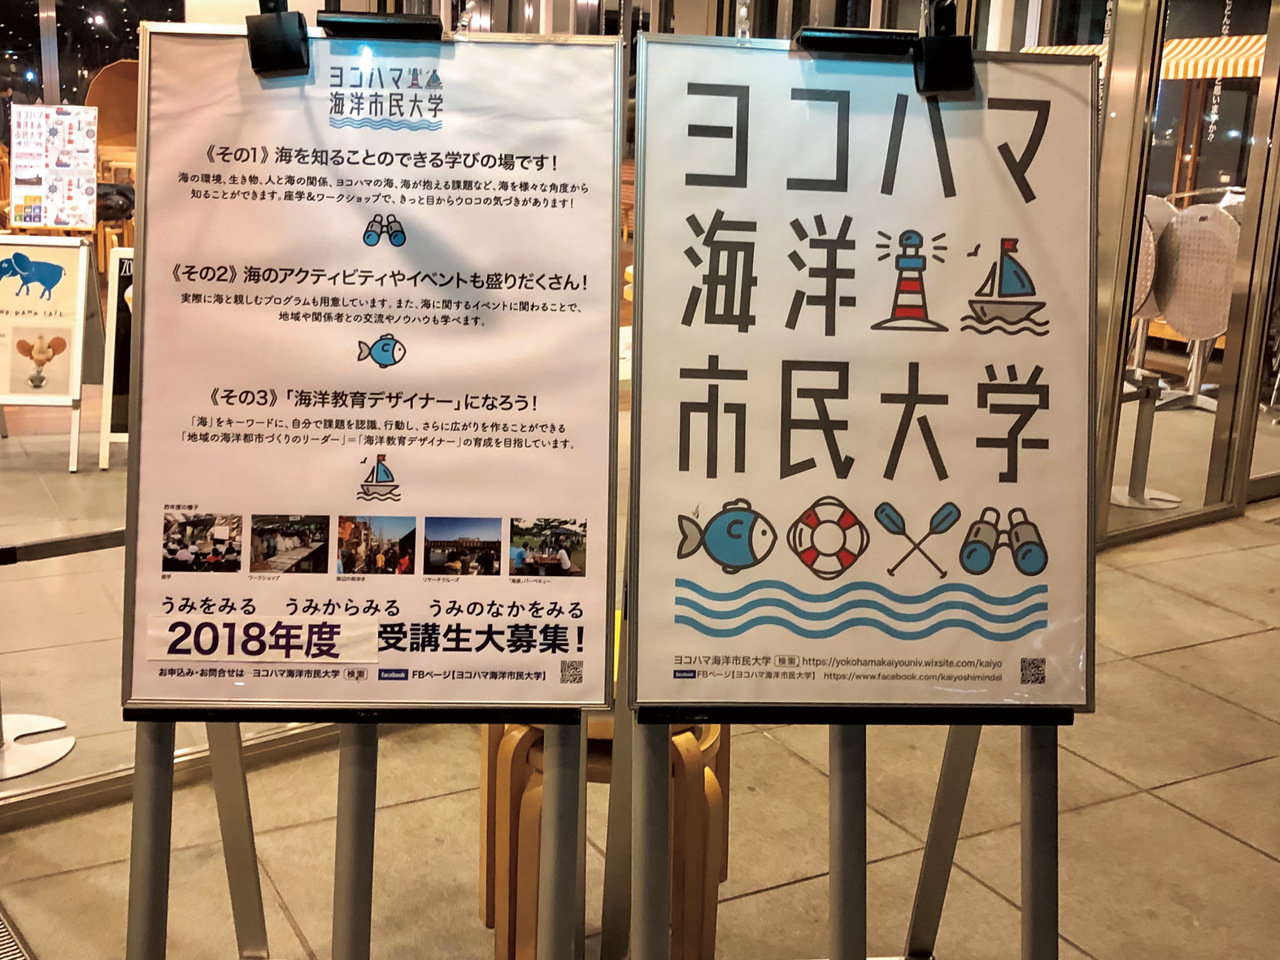 ヨコハマ海洋市民大学(神奈川県横浜市)